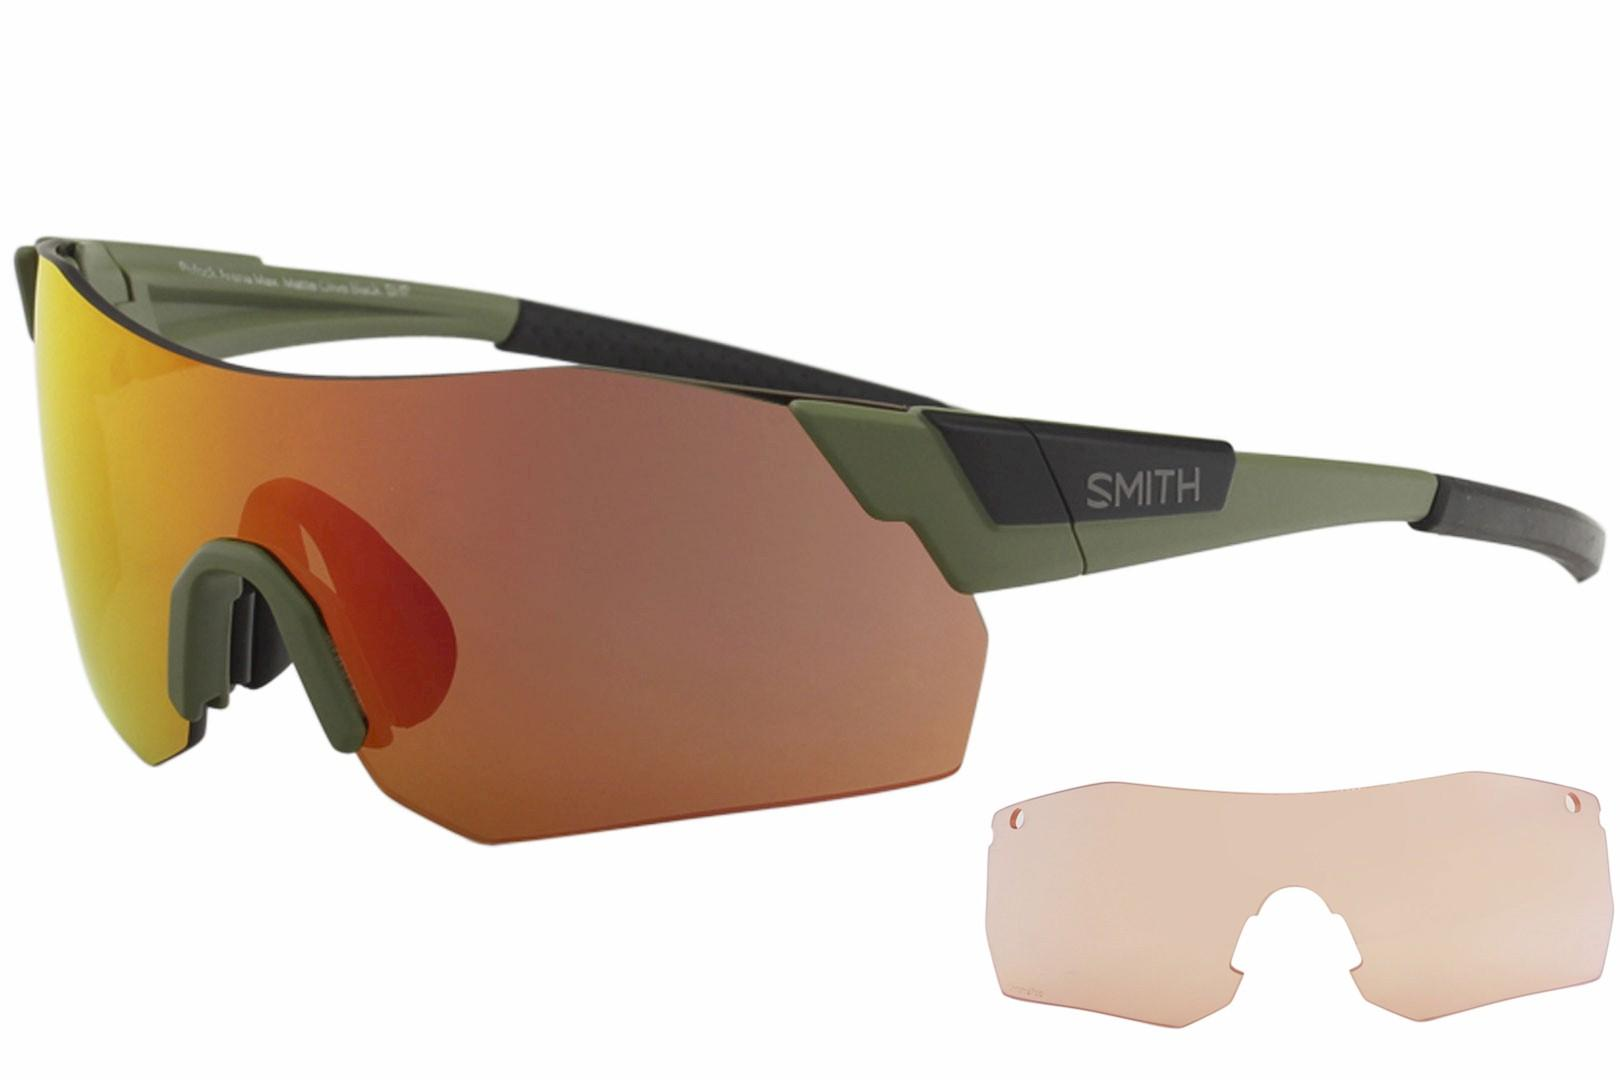 Image of Smith Optics Pivalock Arena Max X6 Fashion Shield Sunglasses - Matte Olive Black/Red Mirrored - Lens 130 Bridge 0 Temple 120mm